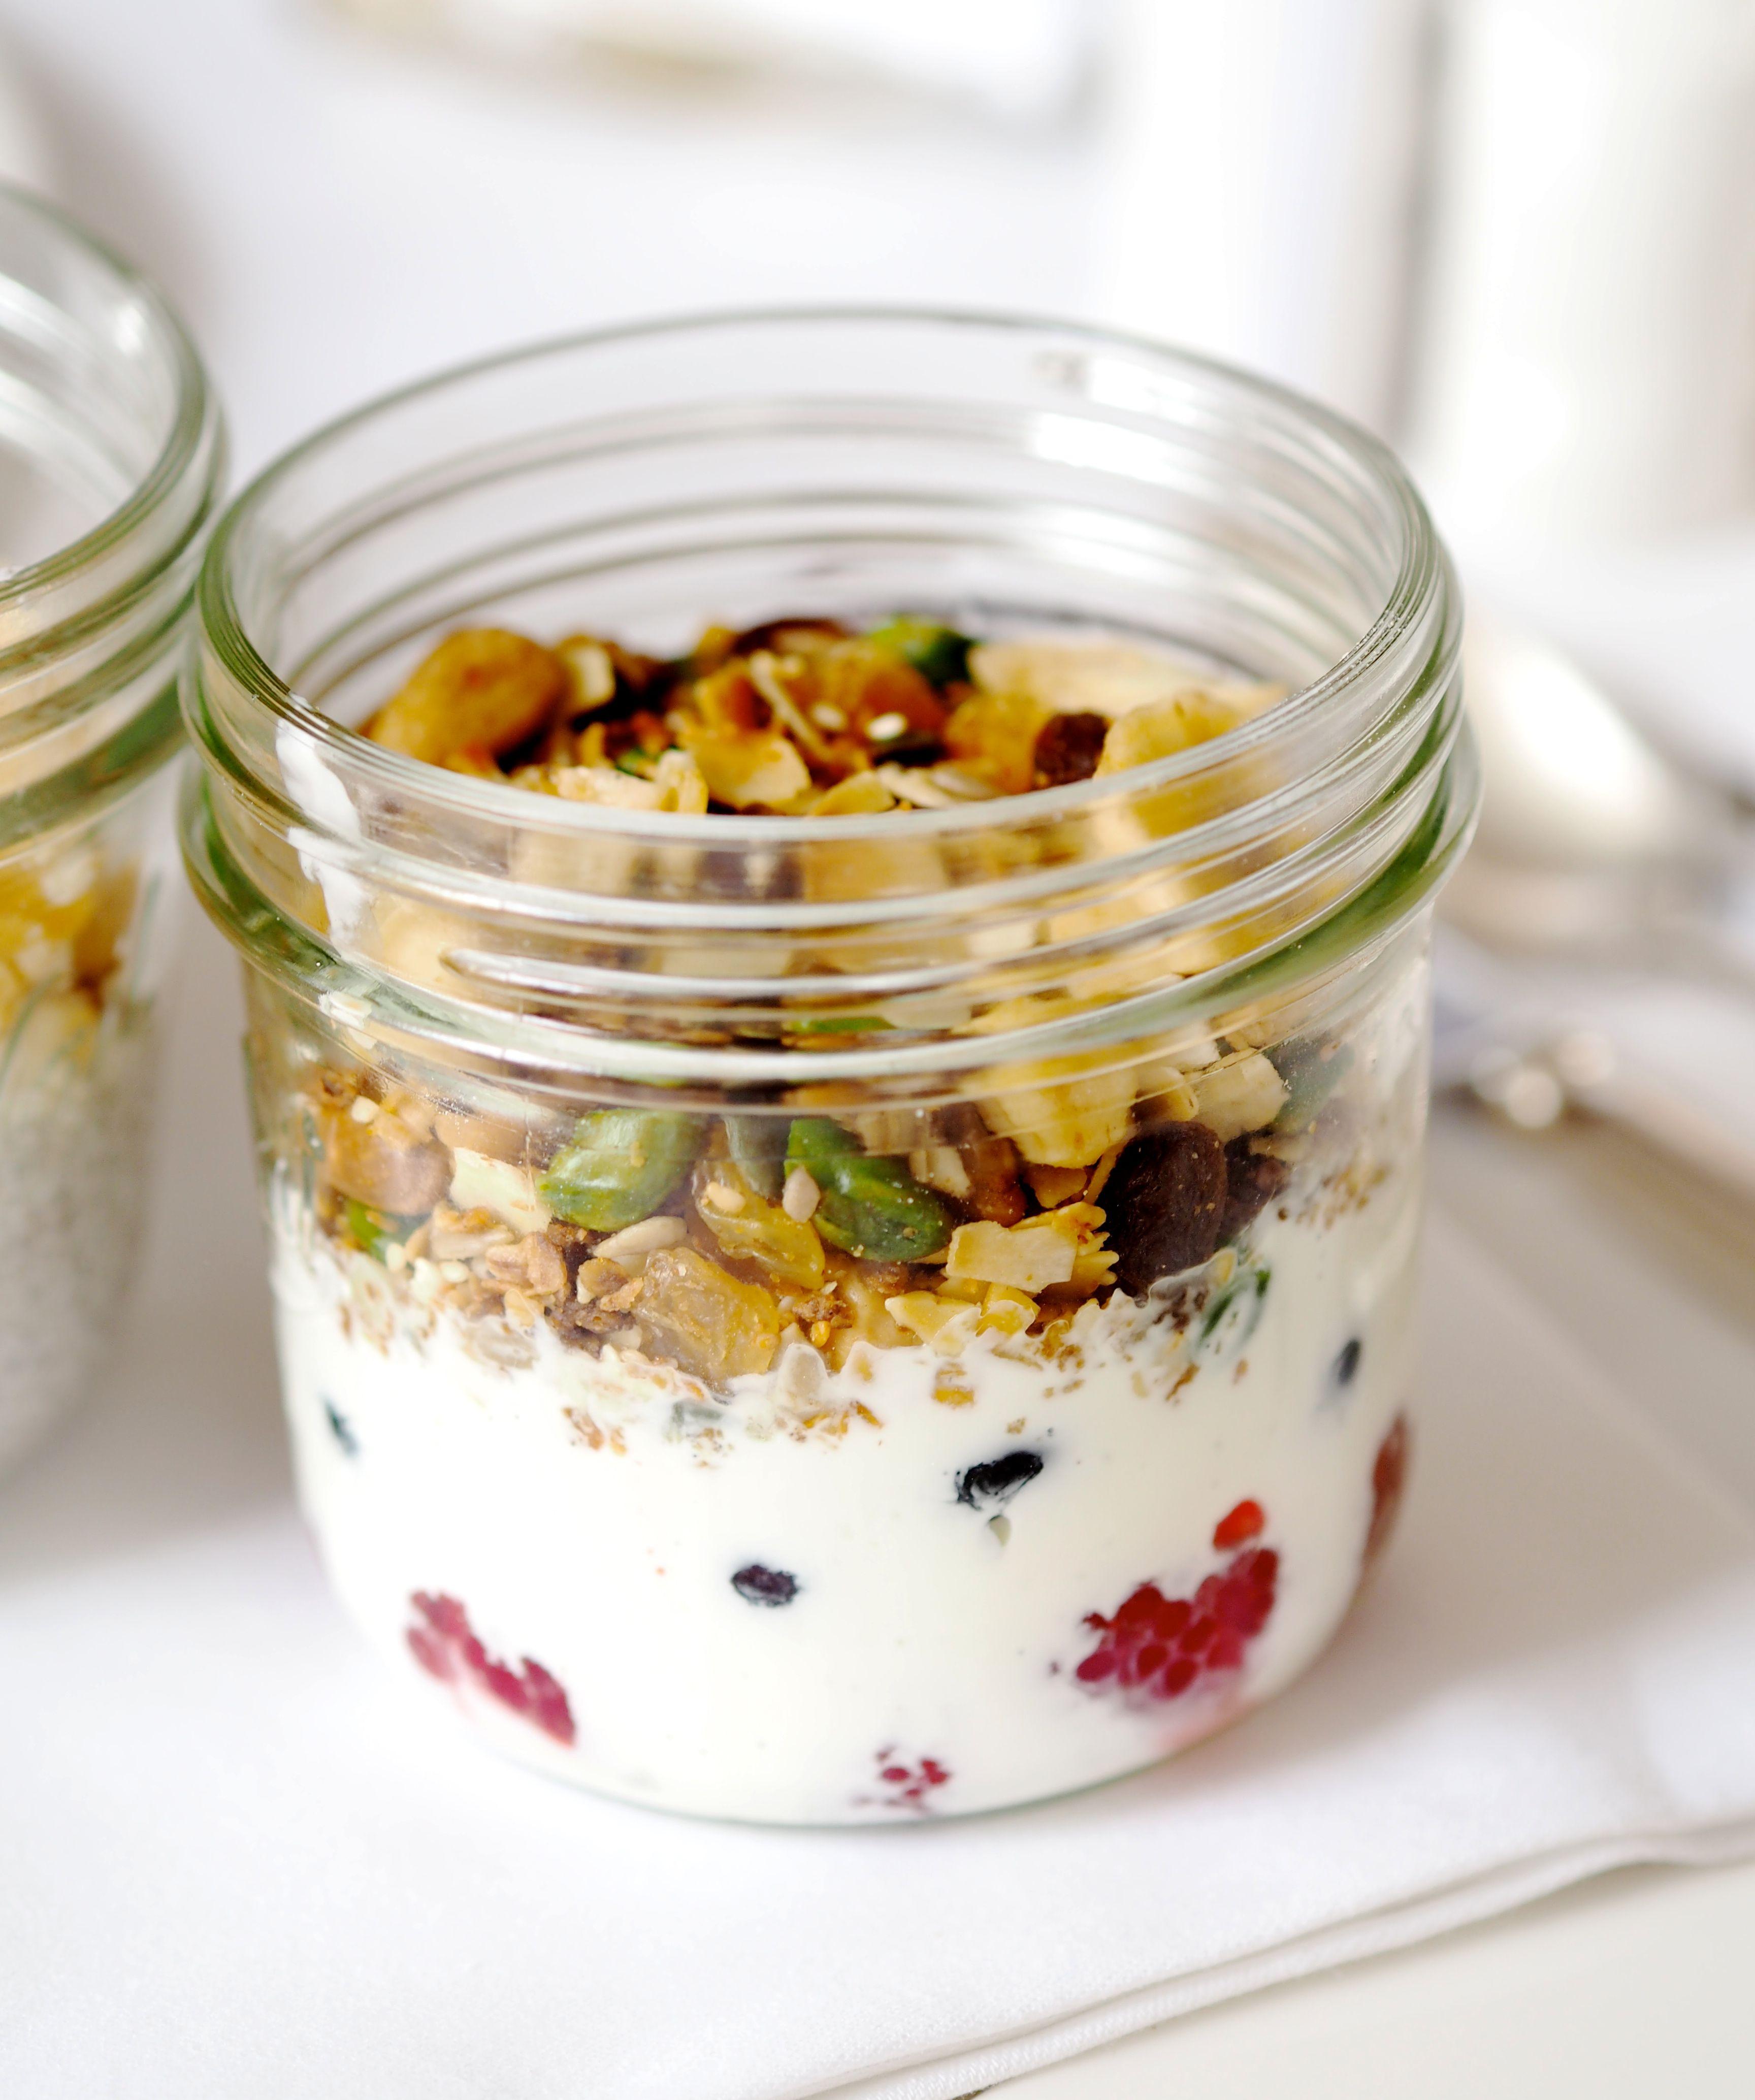 breakfast bowl granola so delicious and healthy  See more http://recipesheaven.com/paleo